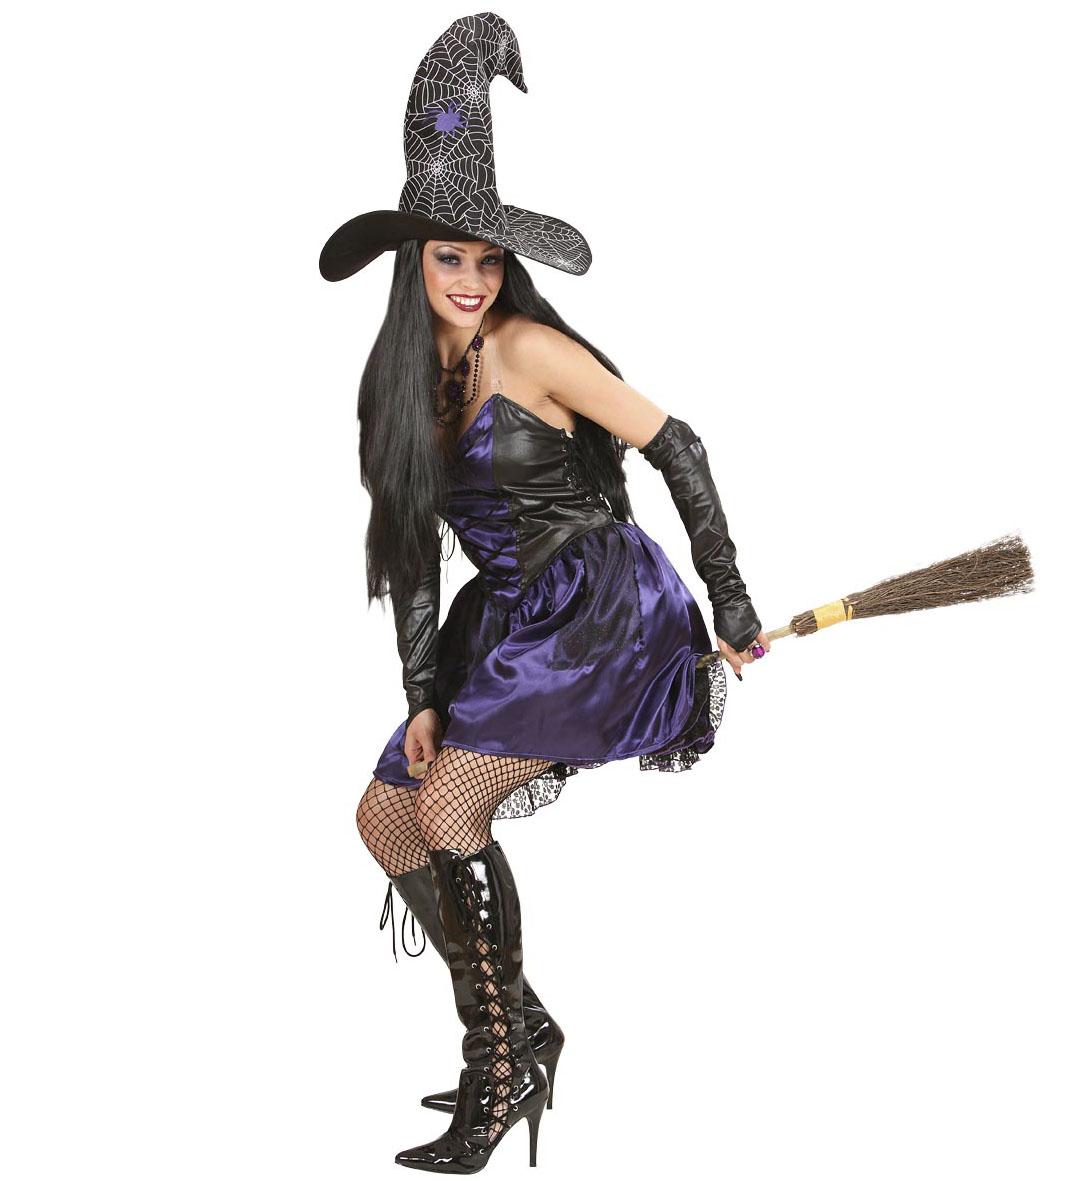 3 tlg Hexen Kostüm, Kleid, Hut, Handschuhe, Damen Gr.36 +Gratisgeschenk